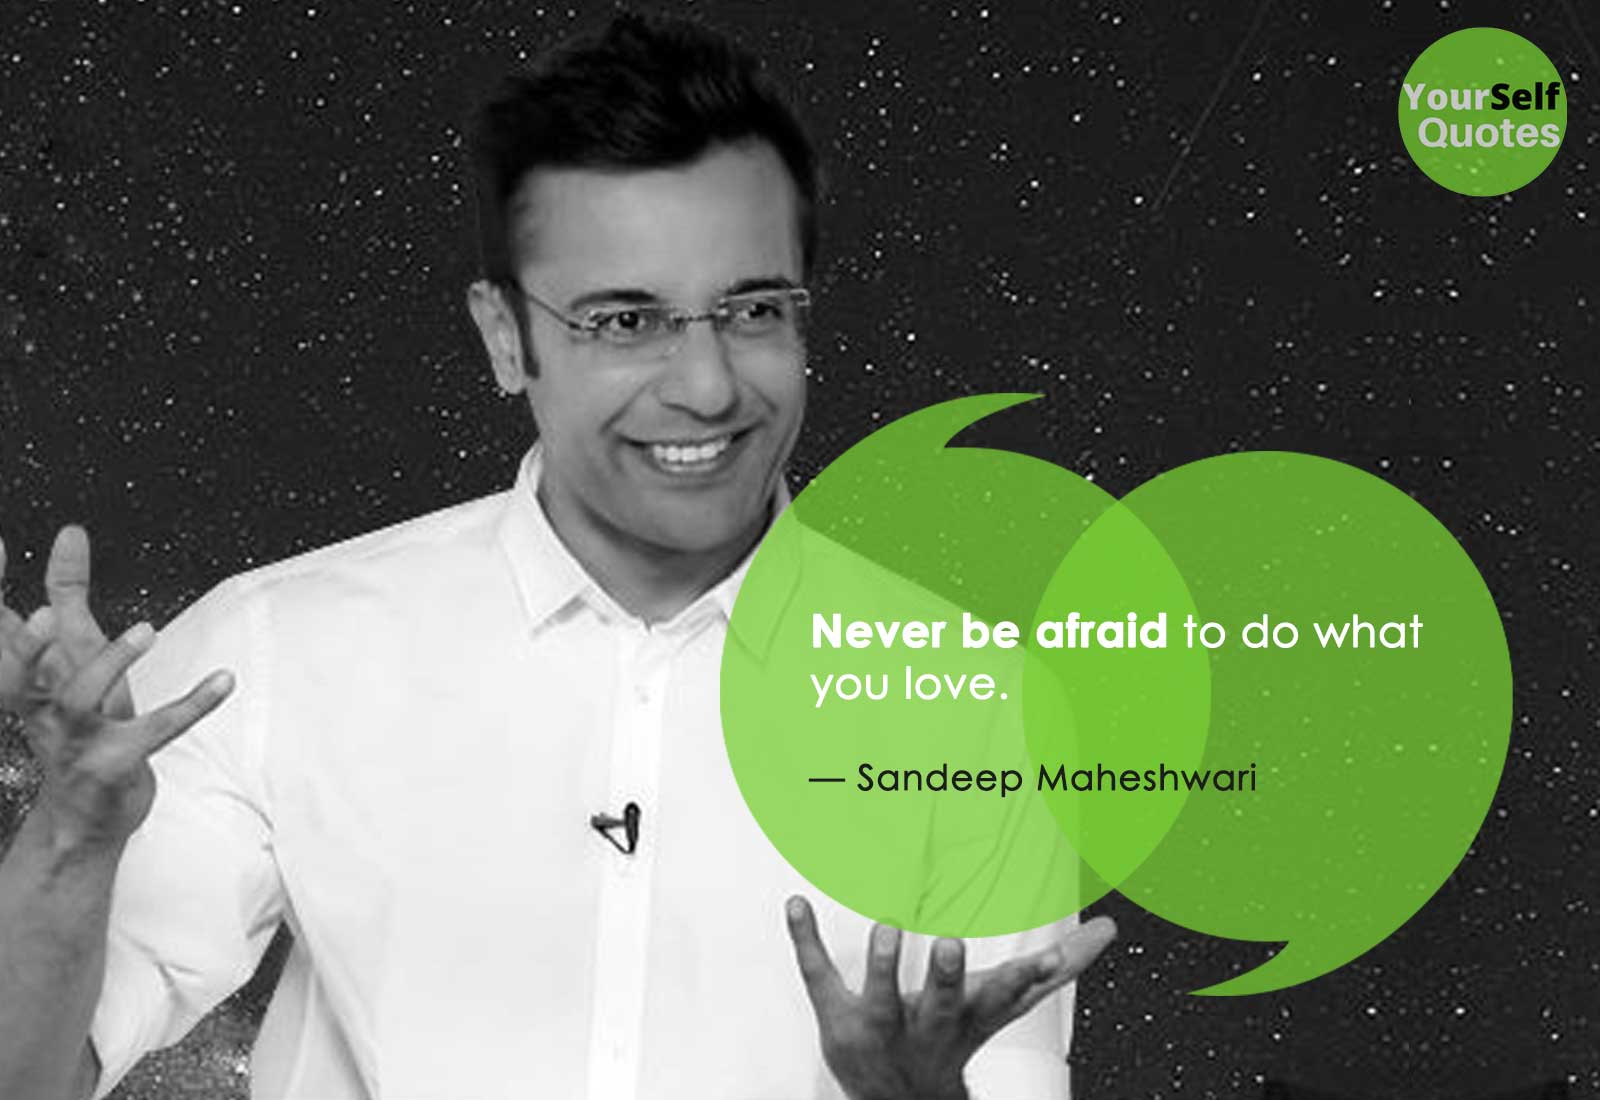 Sandeep Maheshwari Quotes Wallpapers